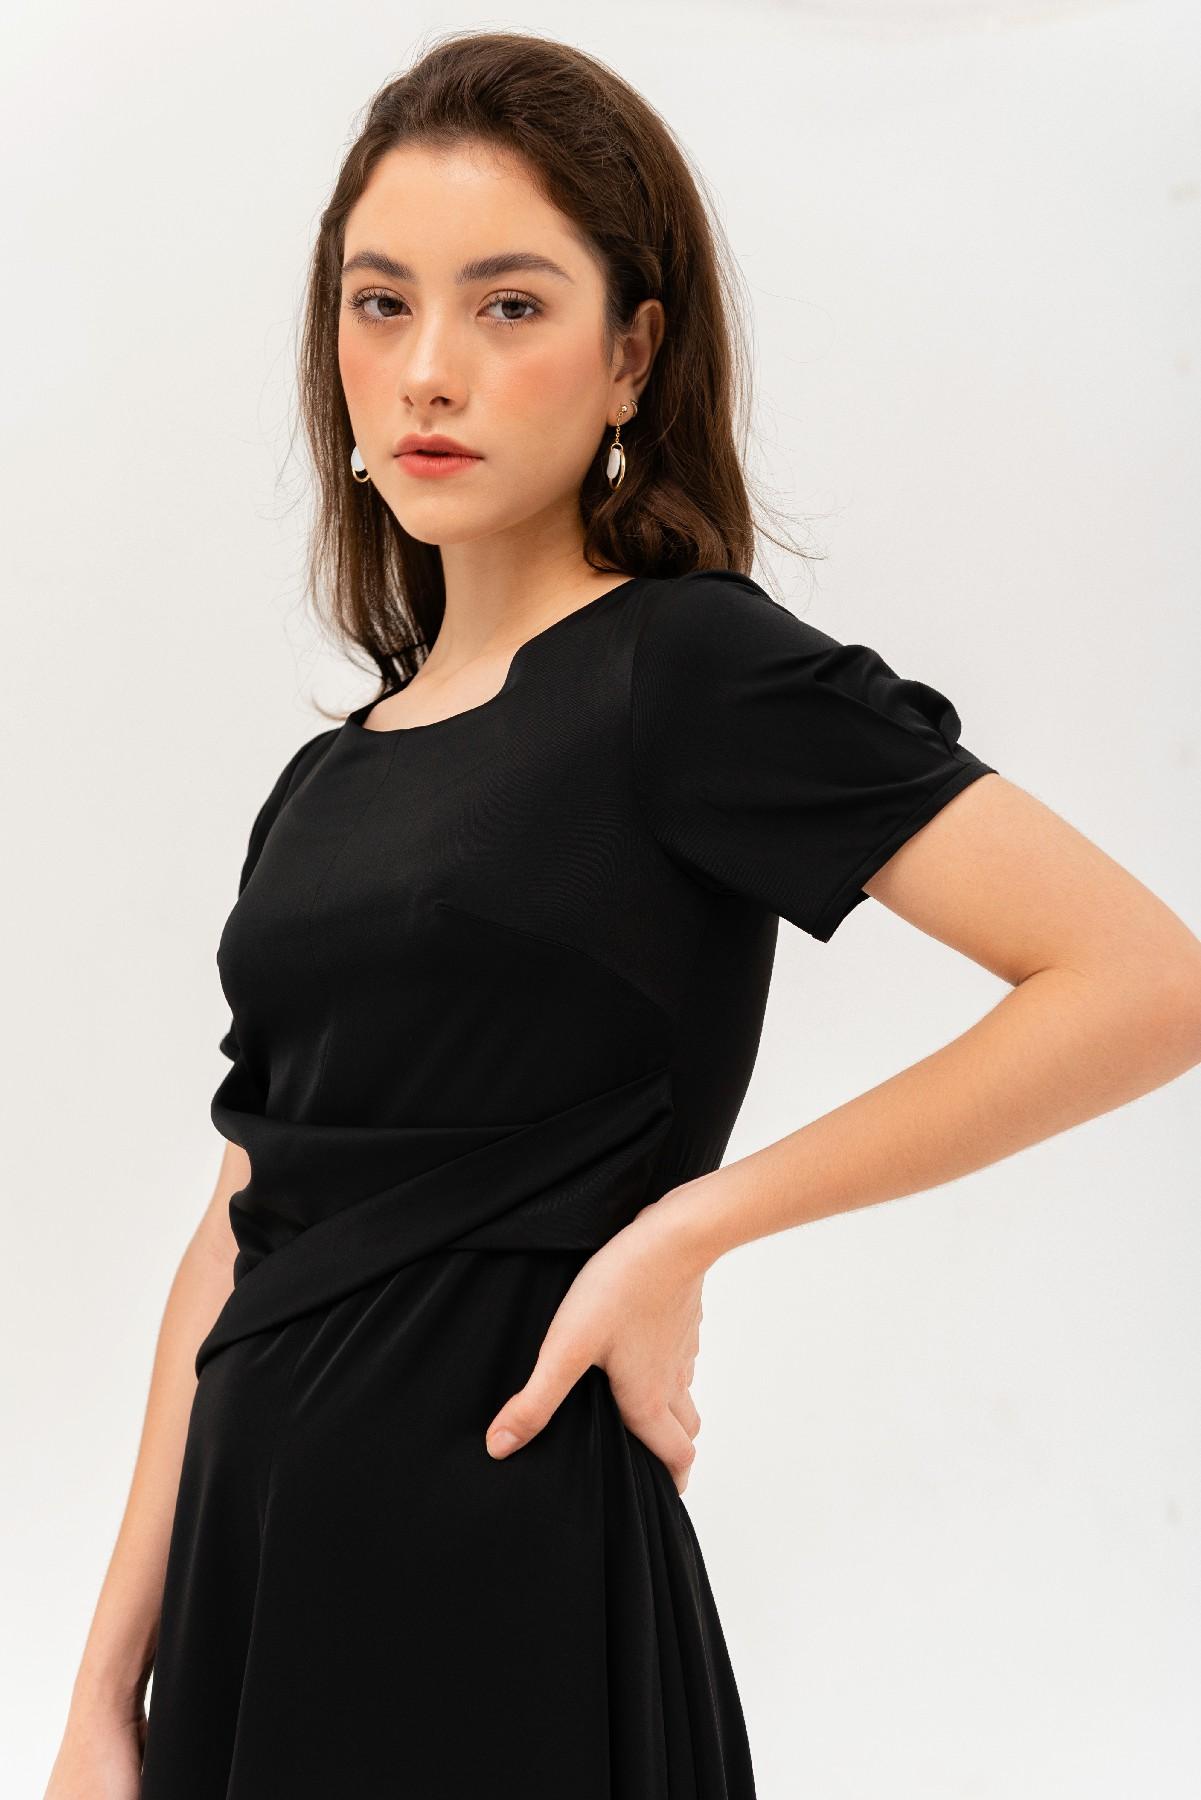 Đầm đen xoắn eo tay ngắn 3